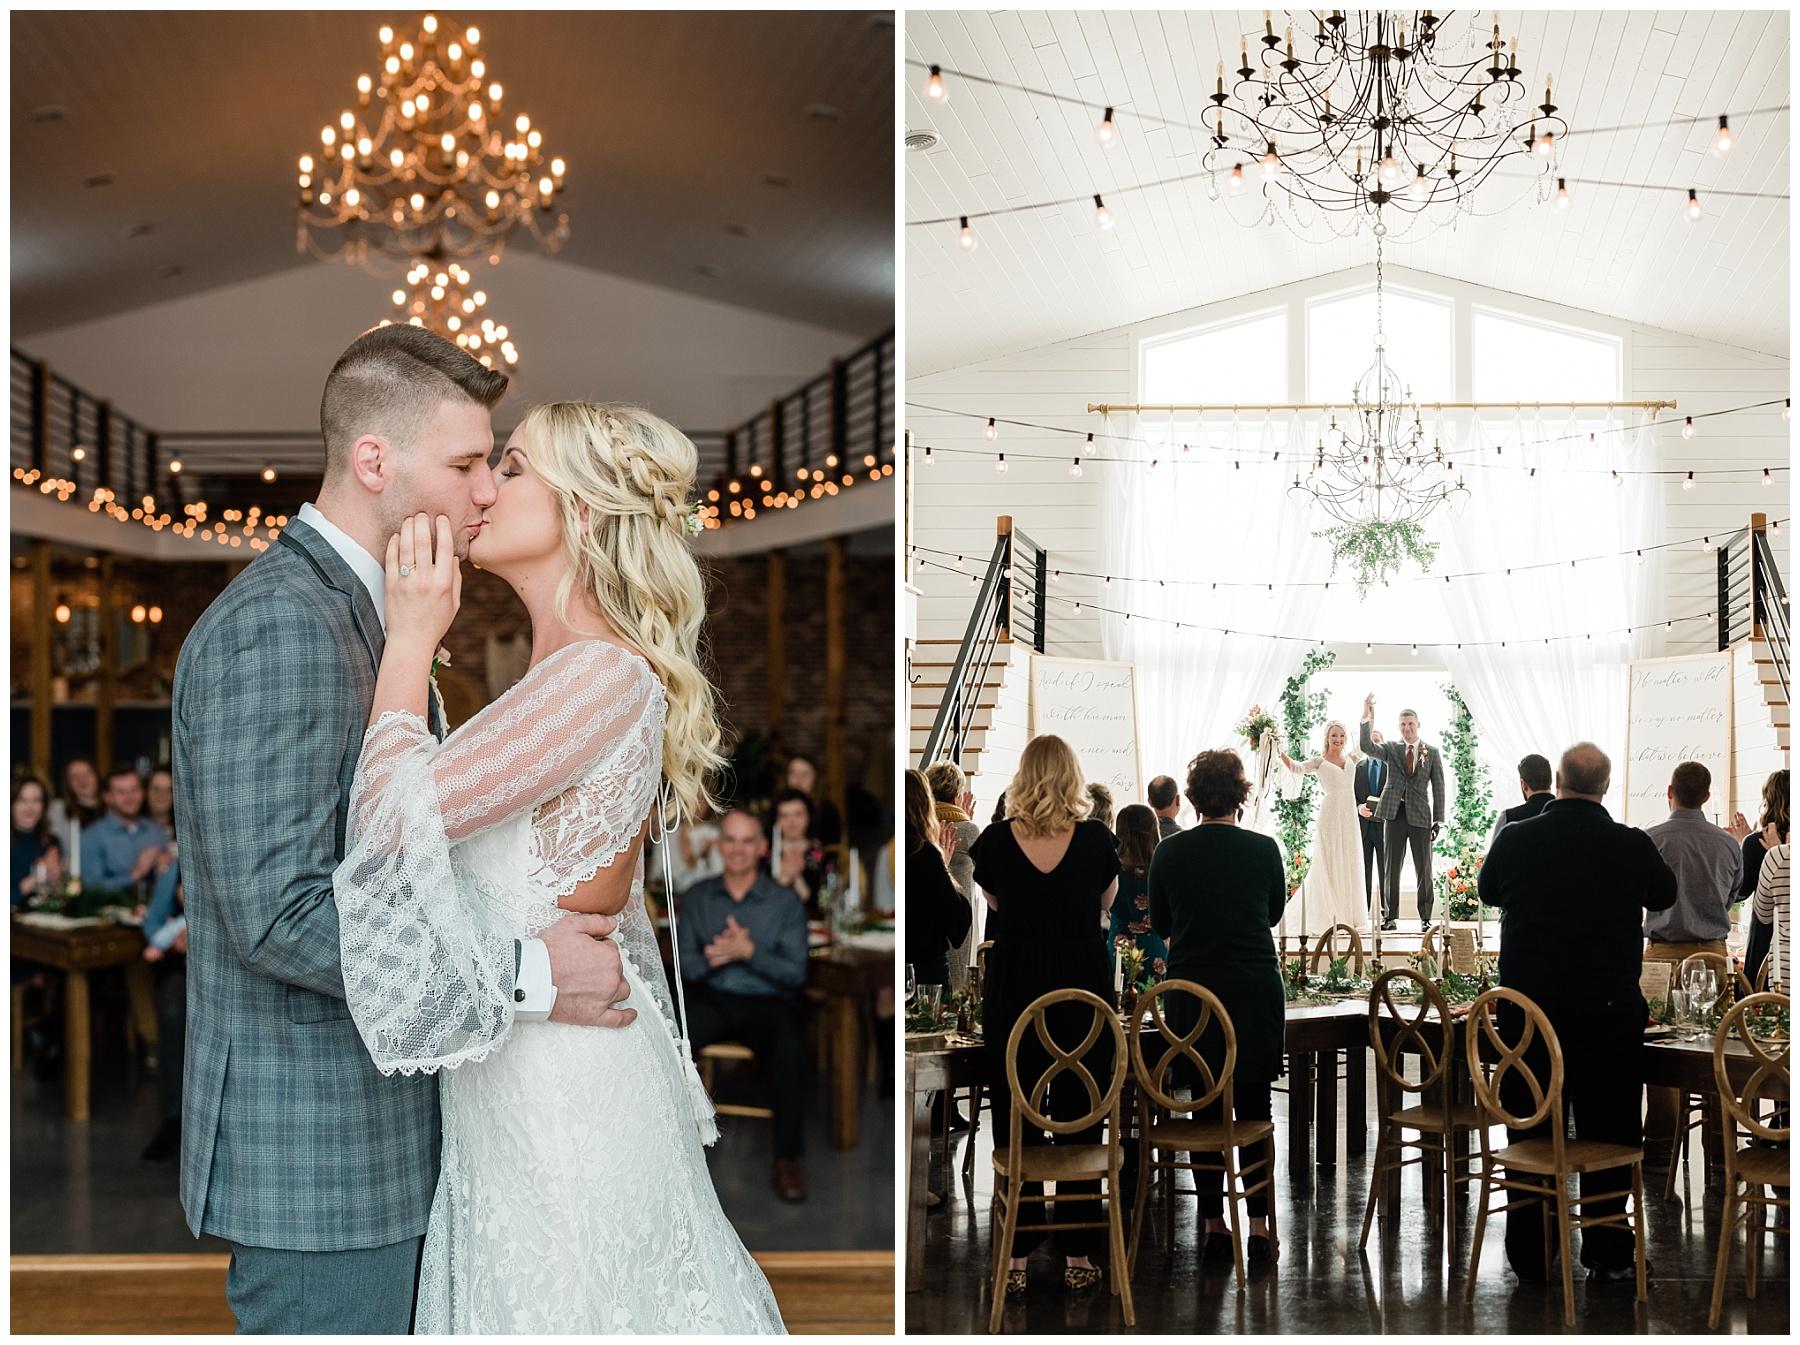 Eclectic Scandinavian Winter Wedding in All White Venue Emerson Fields by Kelsi Kliethermes Photography Best Missouri and Maui Wedding Photographer_0055.jpg